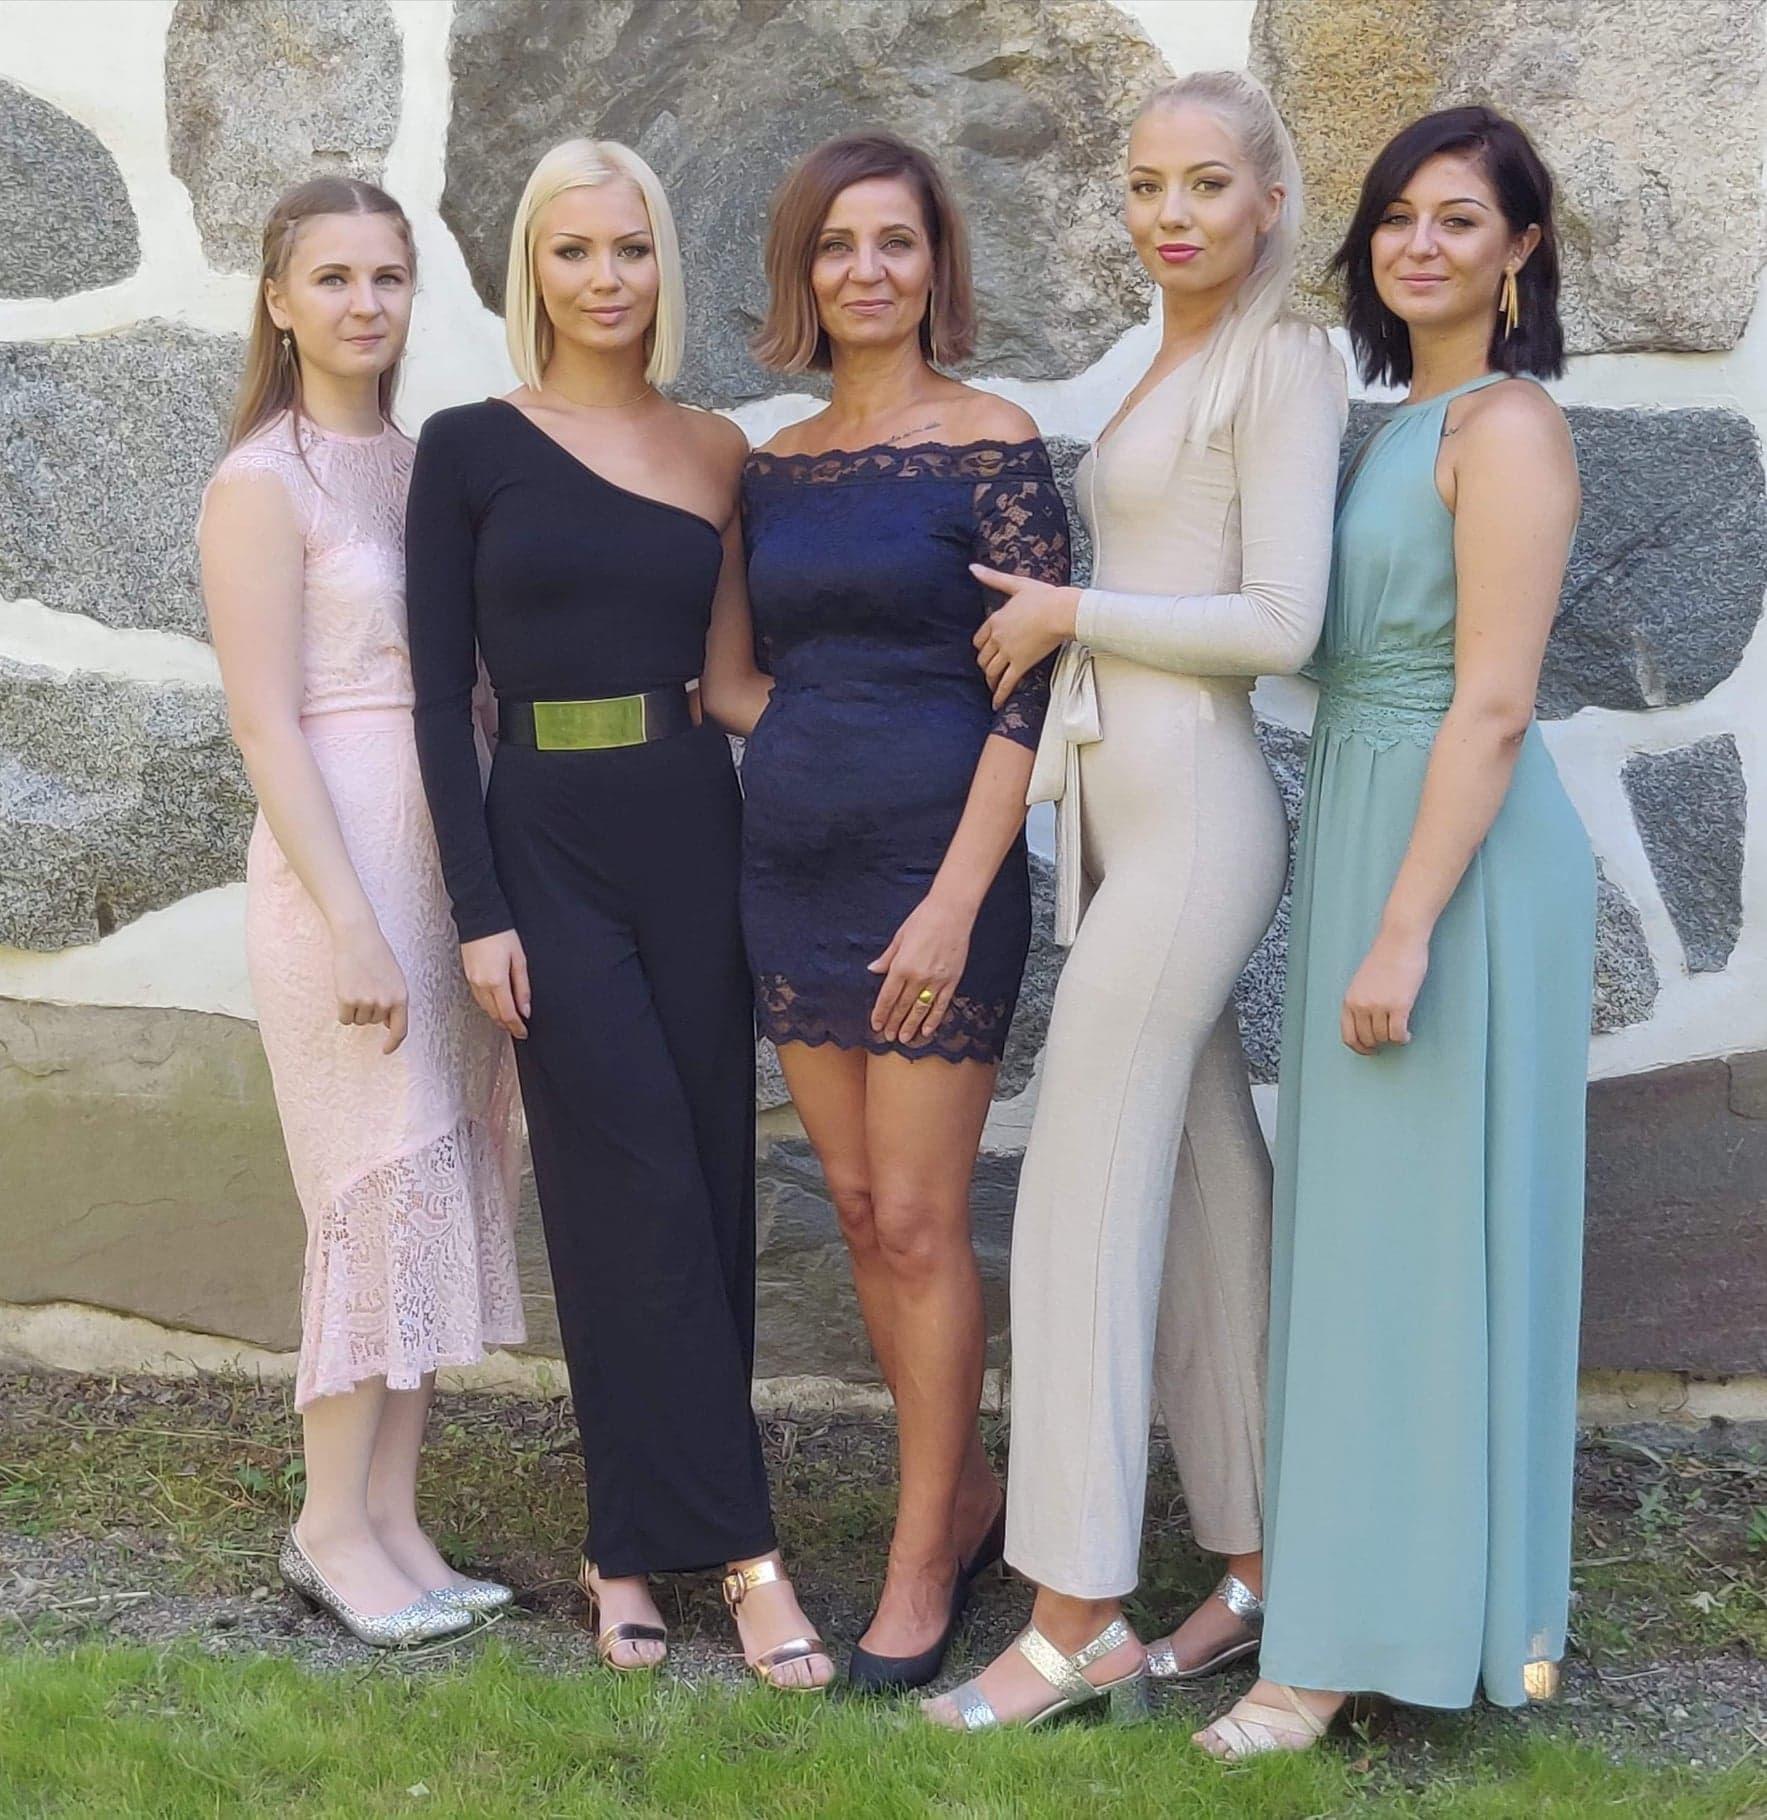 Mariannen perhe